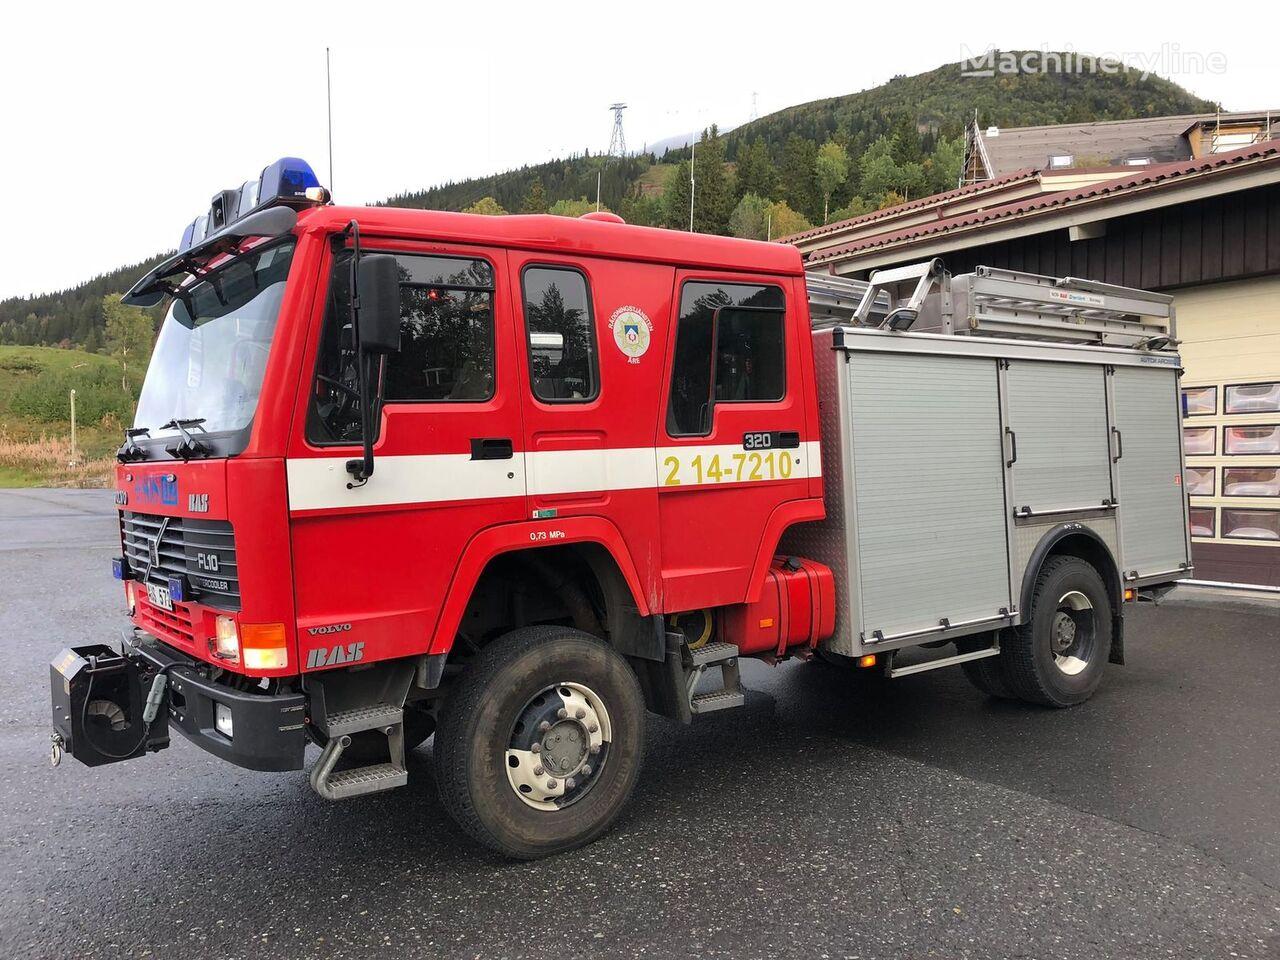 VOLVO FL10 4x4, 1996 - fire engine släckbil autobomba vatrogasno vozilo